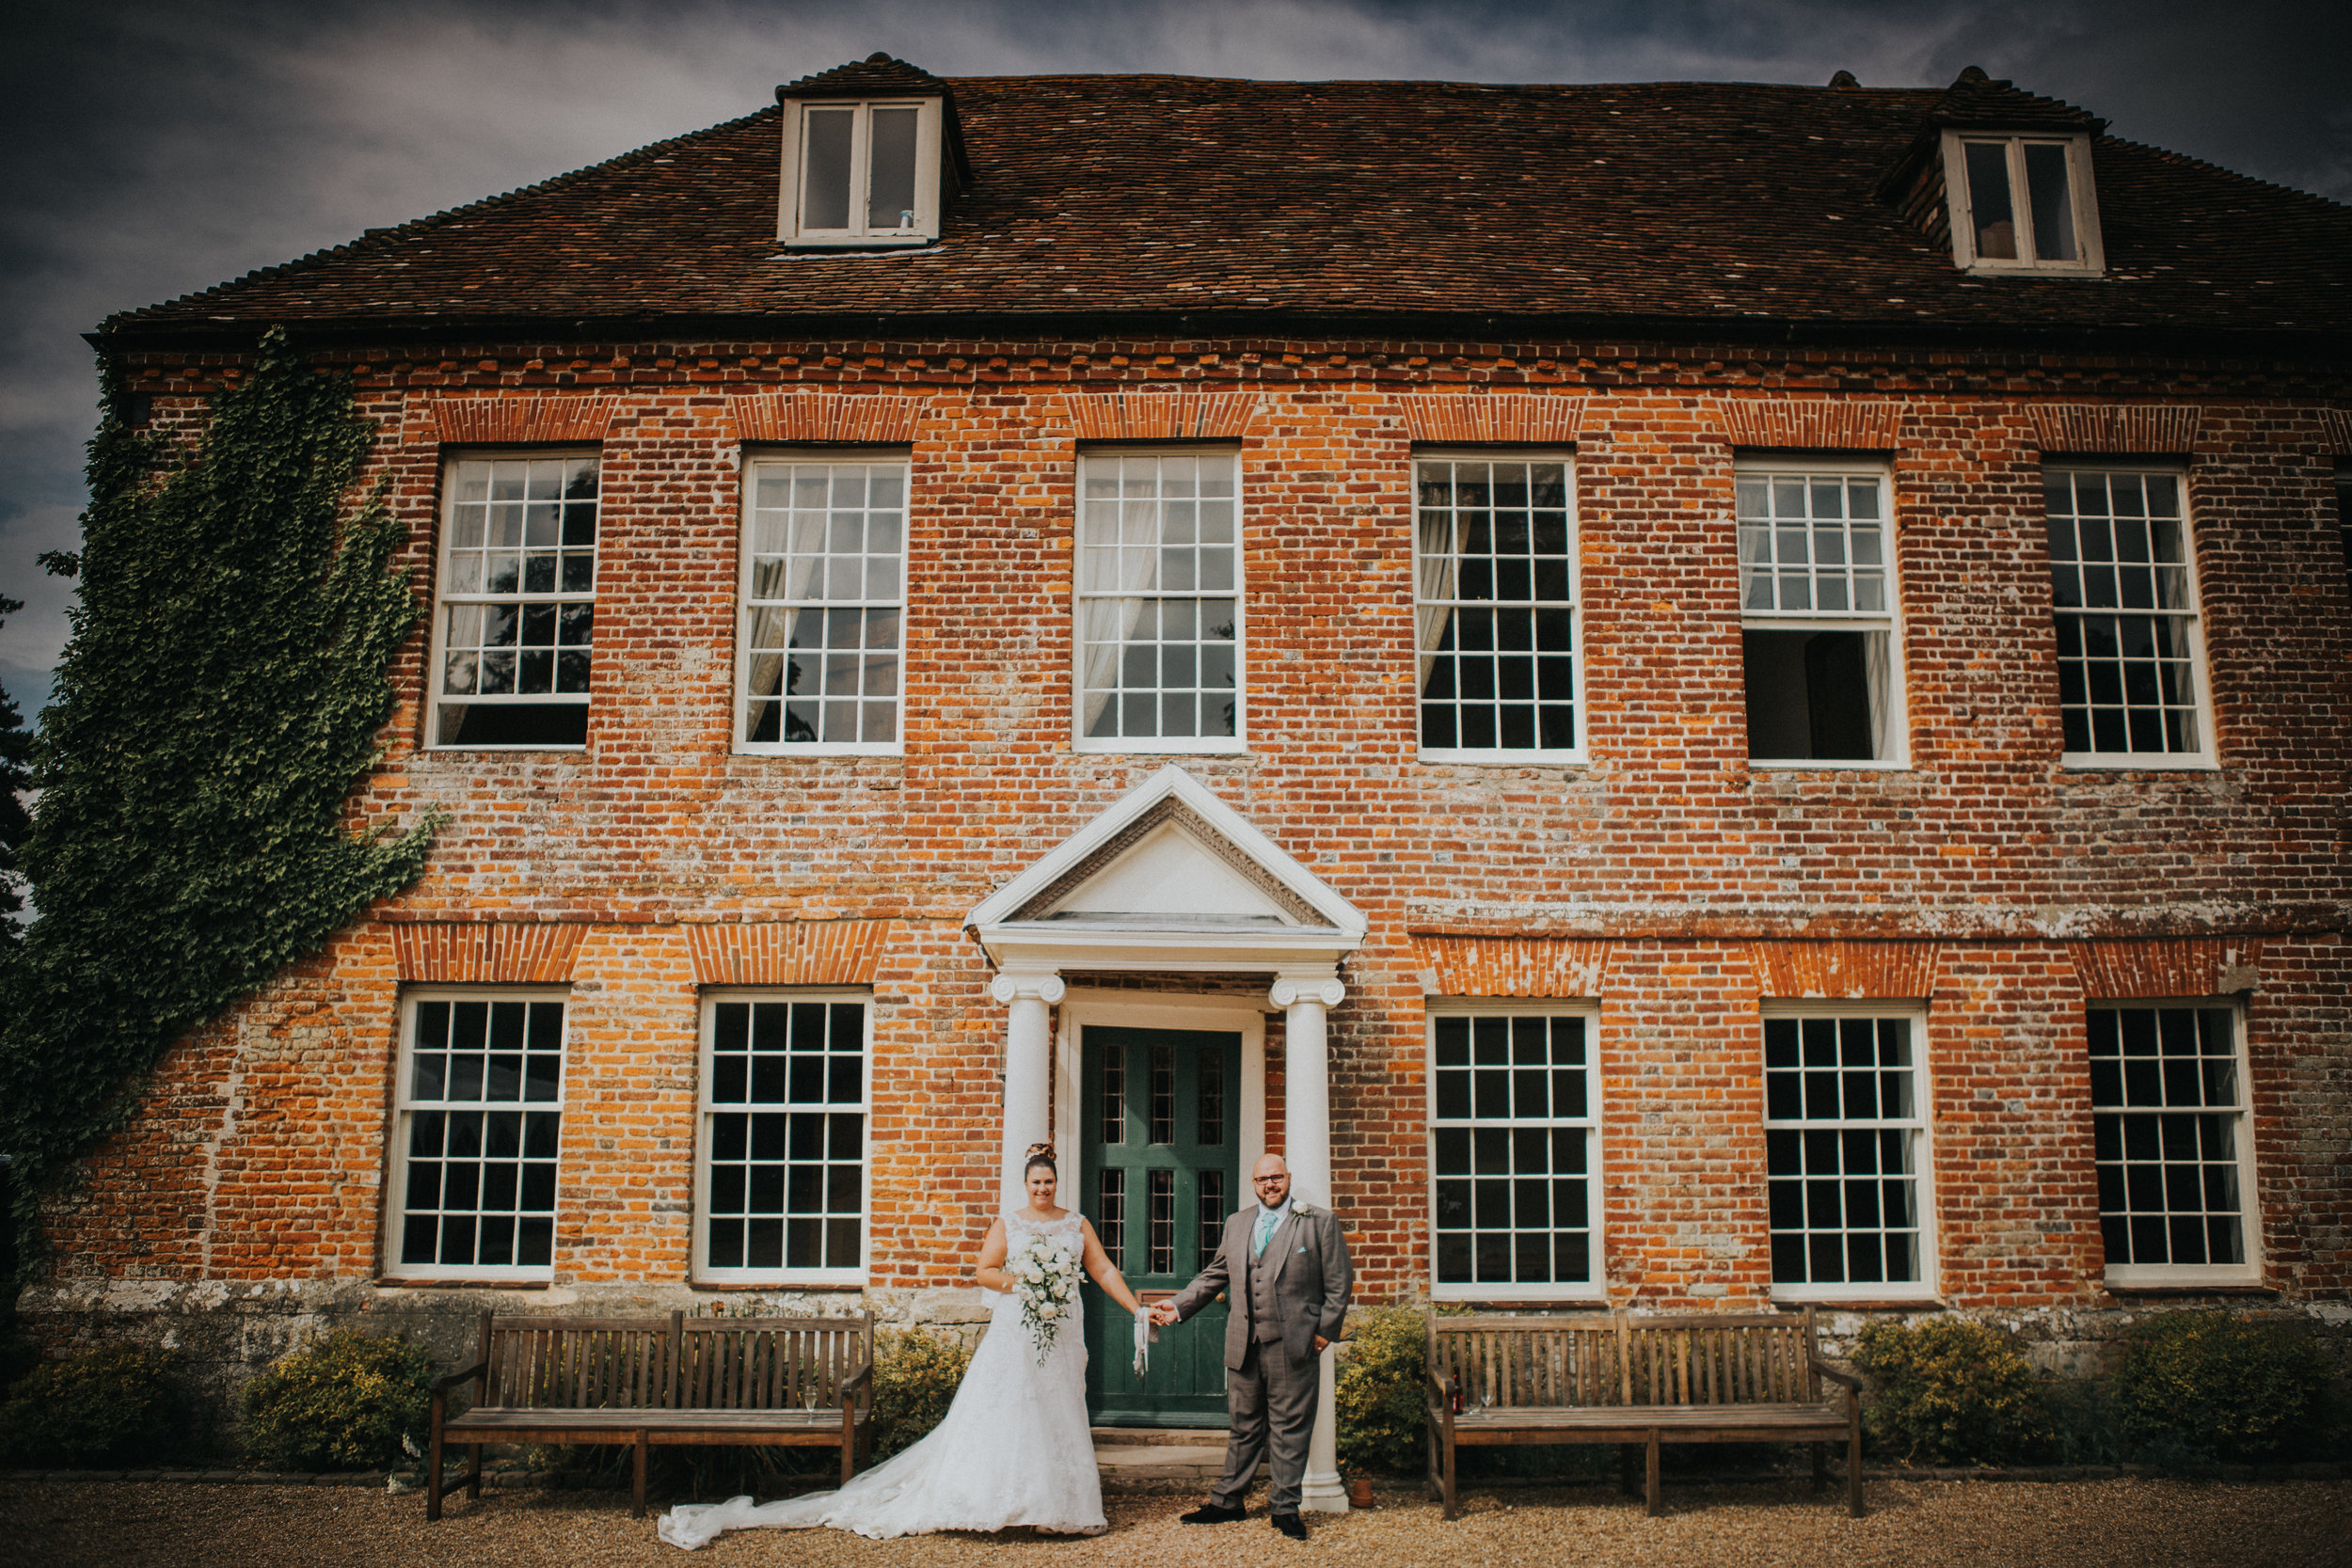 westenhangar-castle-kent-london-wedding-photography-portrait-50